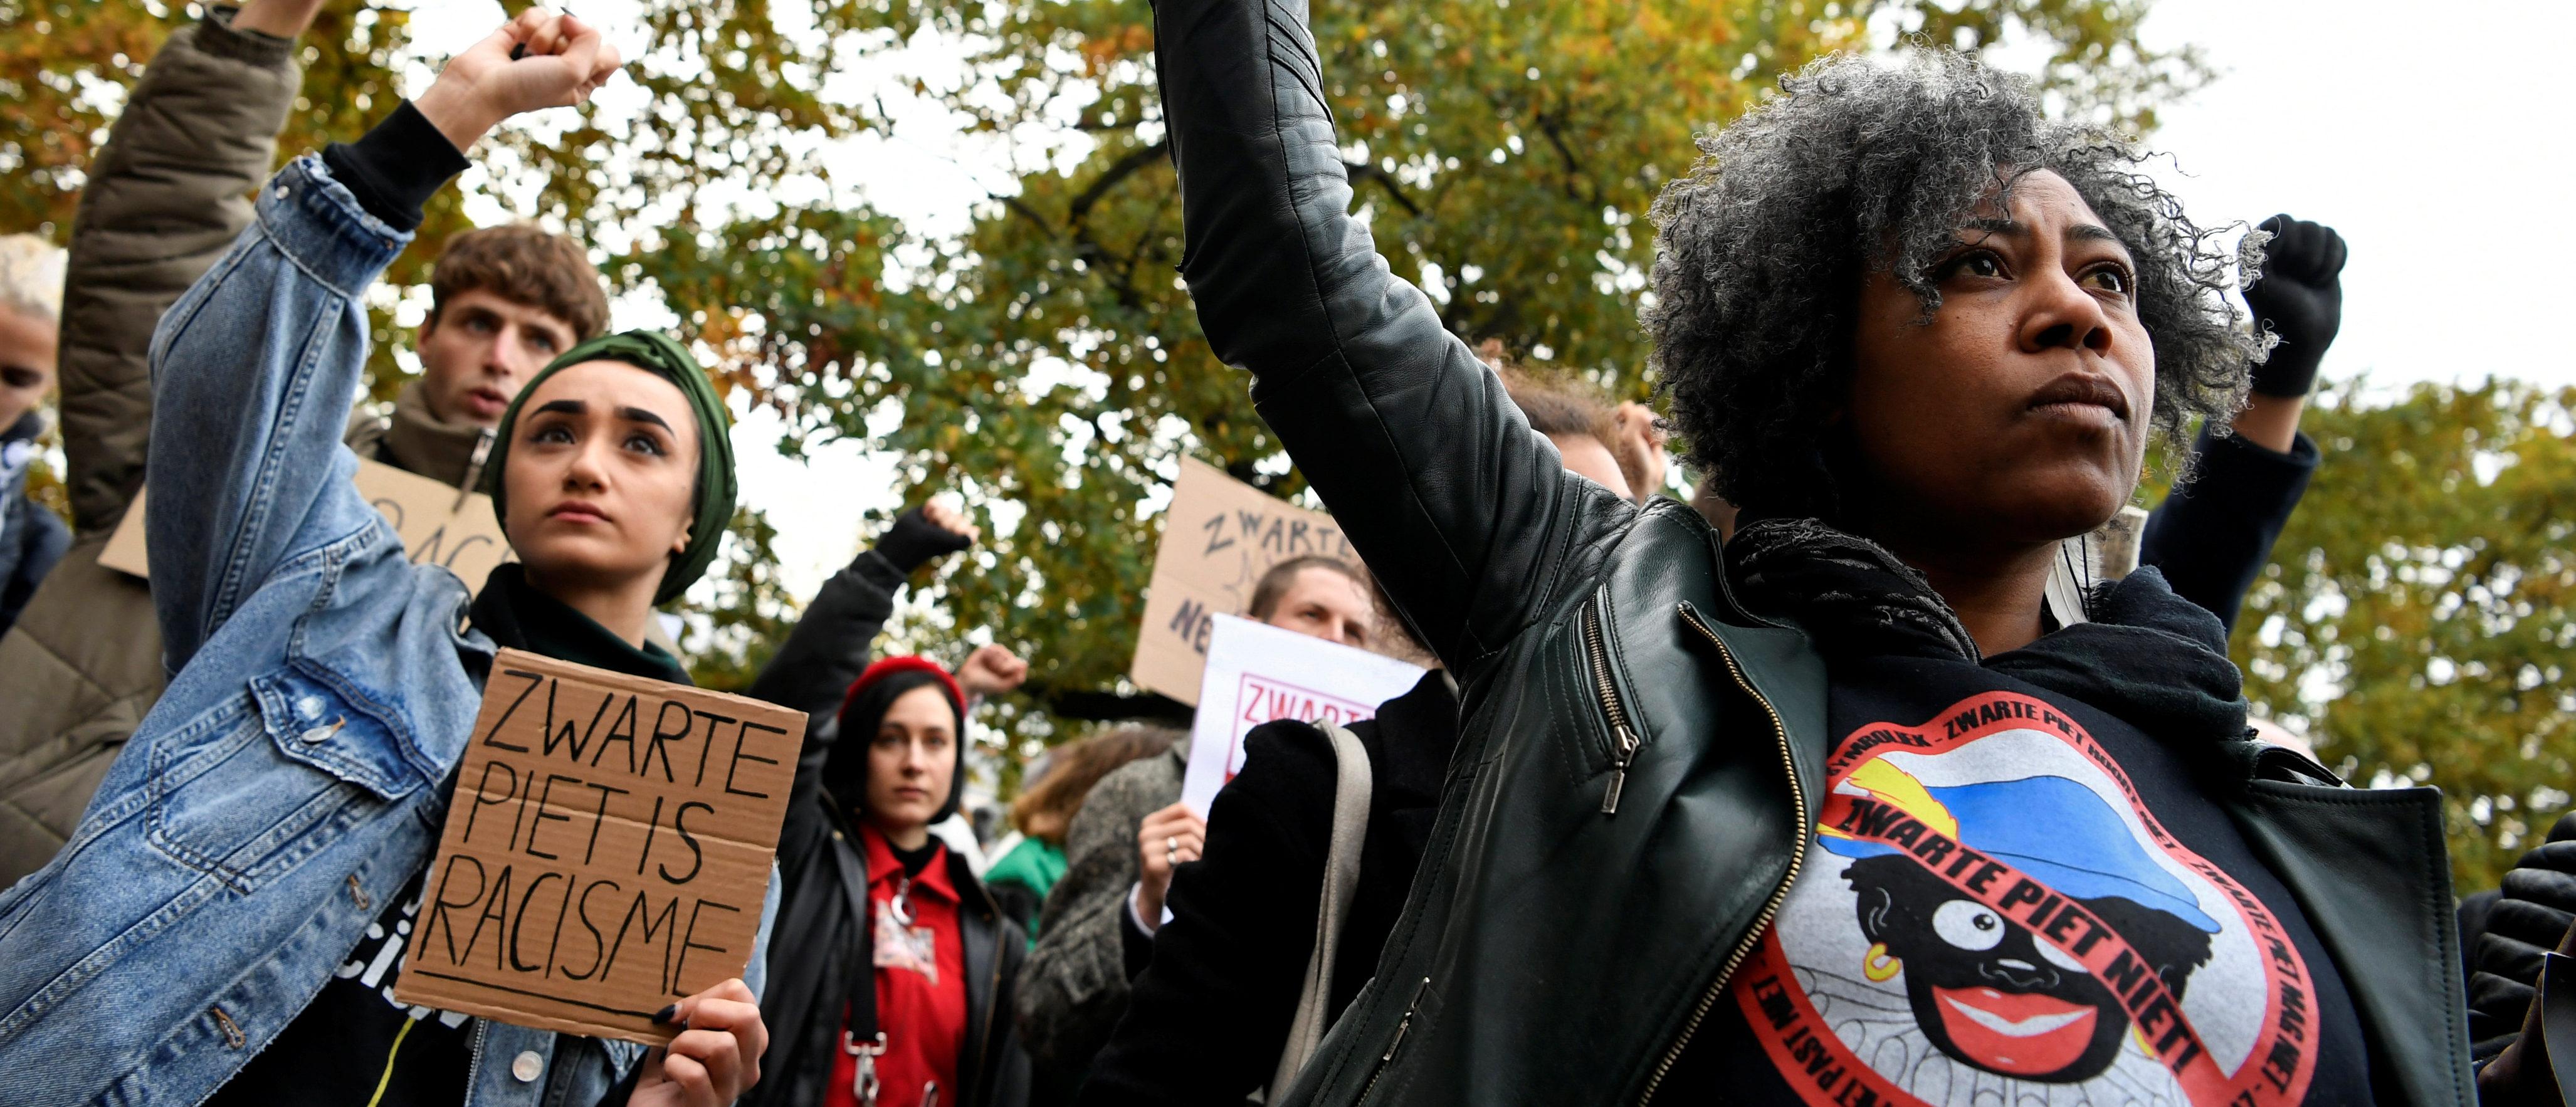 "People protest against the arrival of Saint Nicholas and his assistants called ""Zwarte Piet"" (Black Pete) in The Hague, Netherlands, November 16, 2019. REUTERS/Piroschka van de Wouw - RC2DCD9Q27LQ"